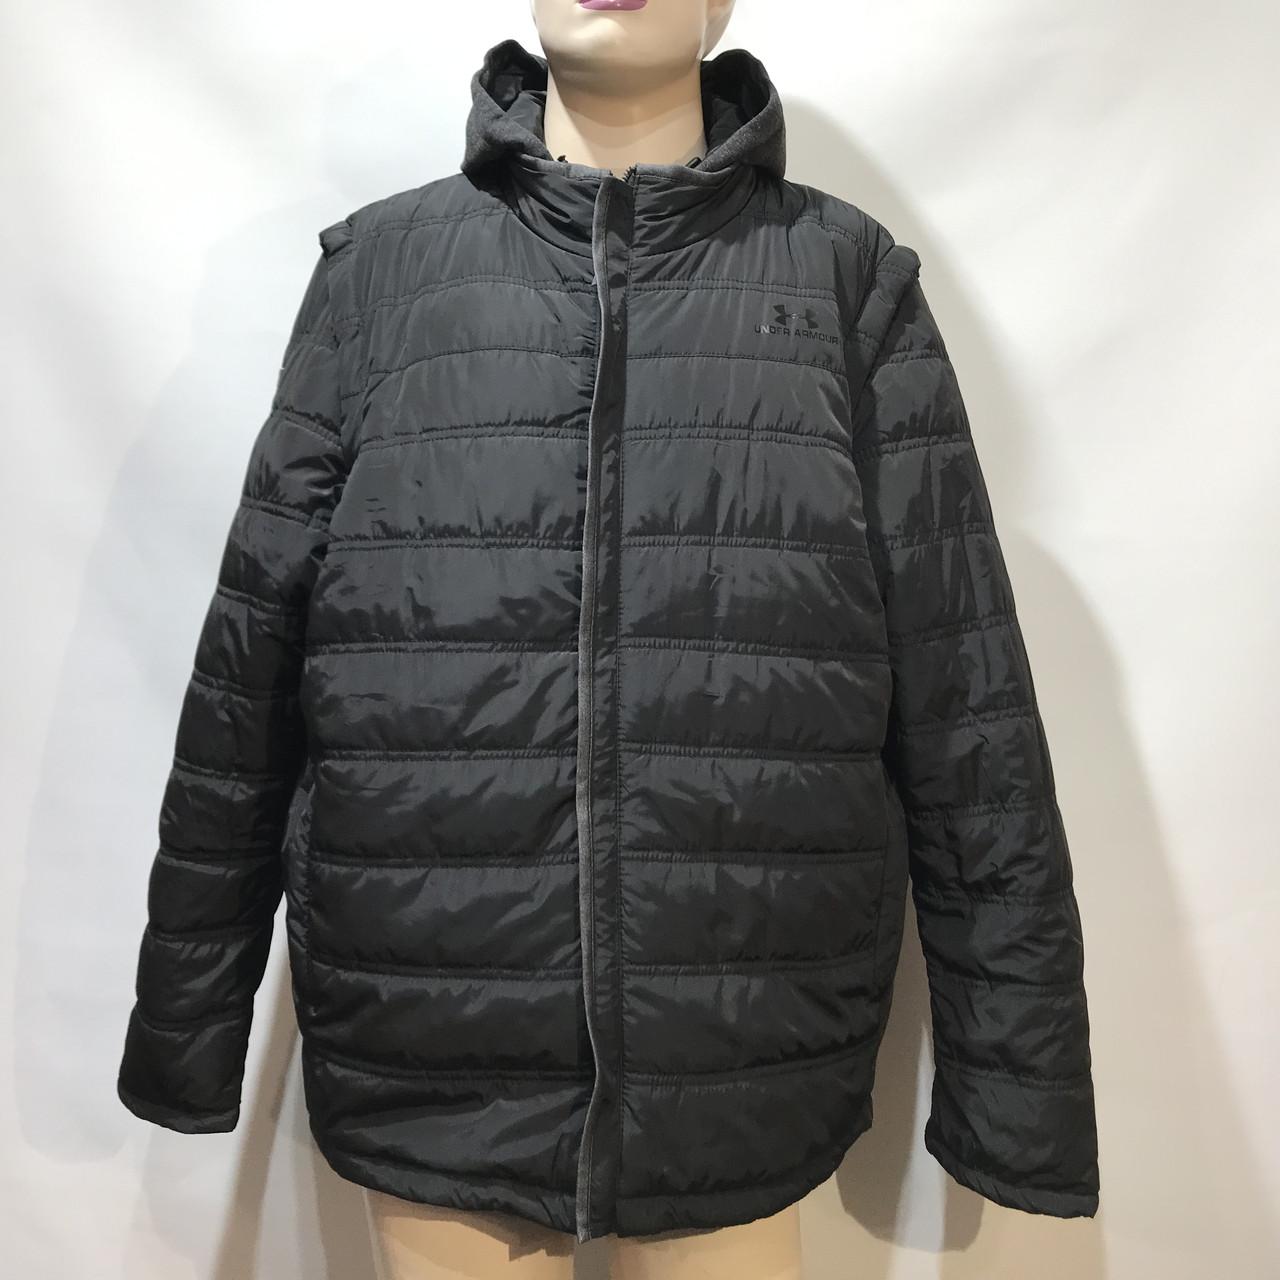 Куртка-жилетка мужская Under Armour  /размеры 56-64/  черная